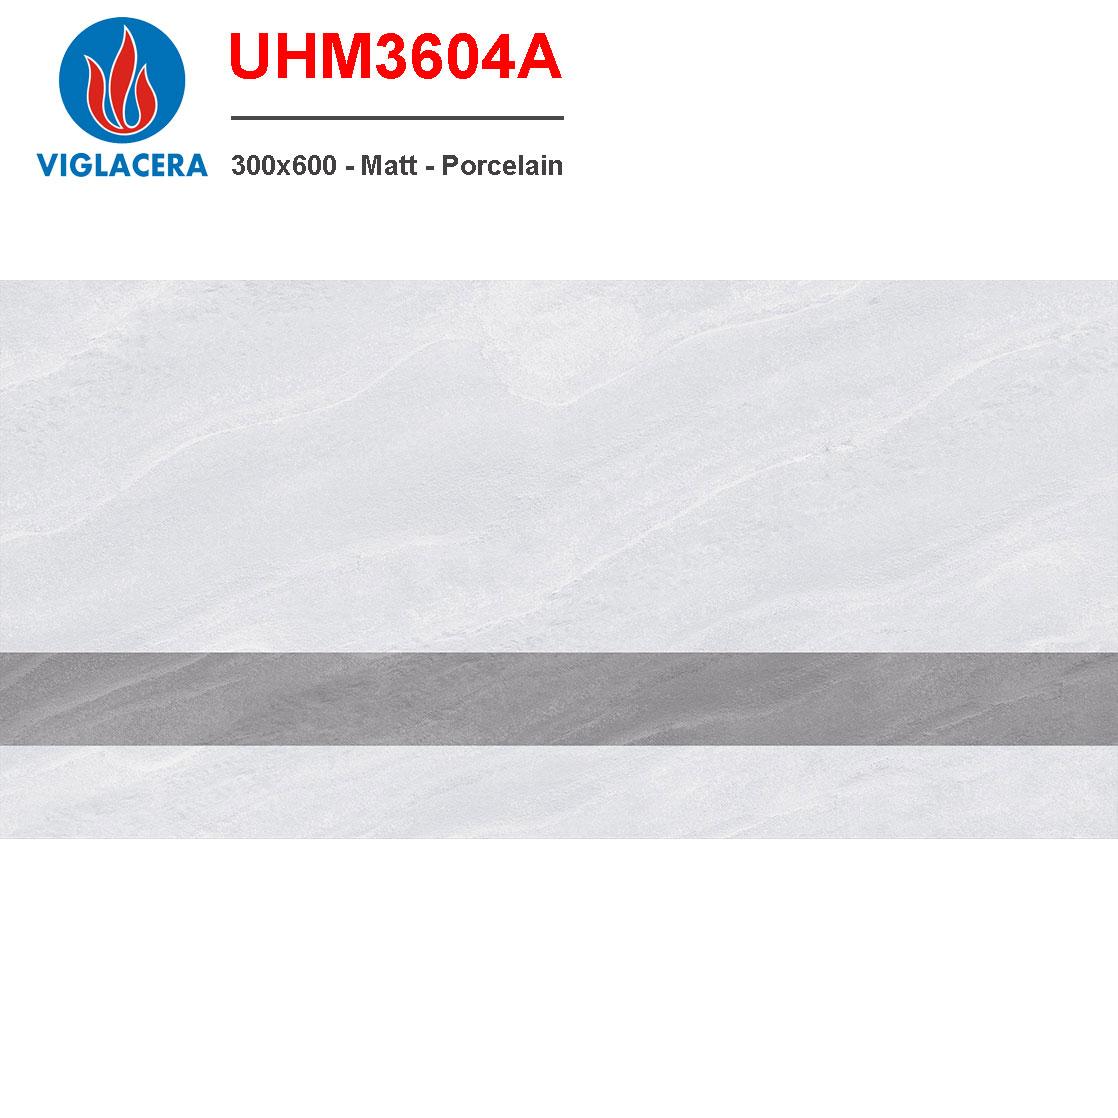 Gạch ốp lát Viglacera 300x600 UHM3604A giá rẻ